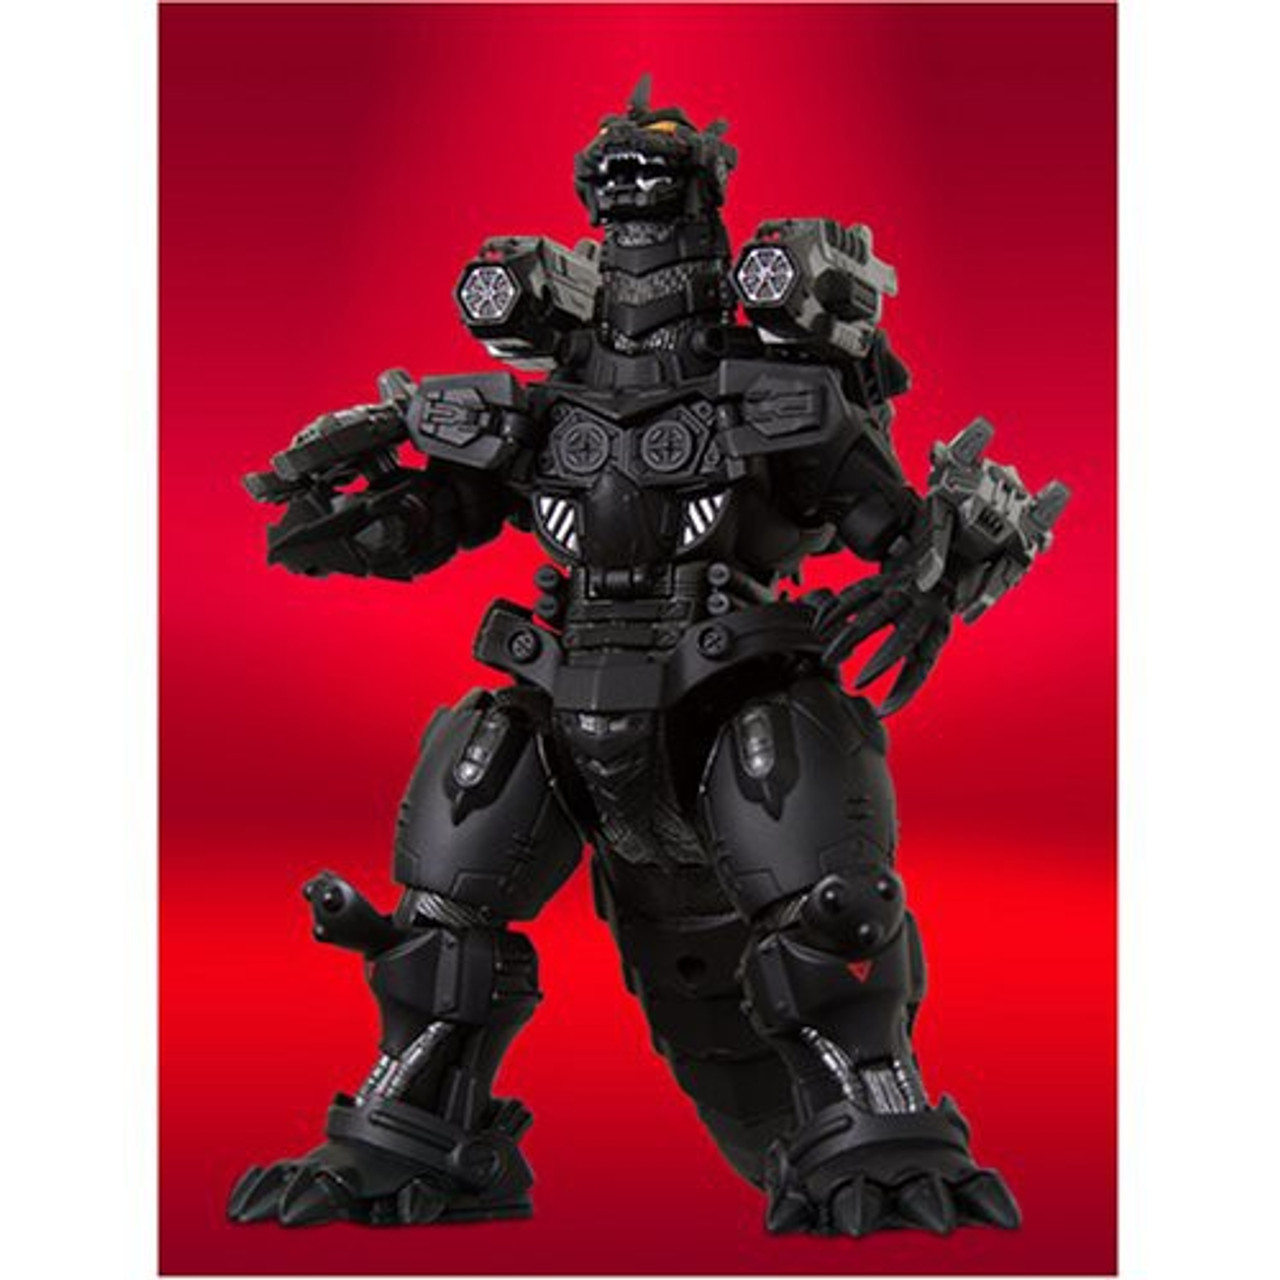 Mecha Godzilla Diecast Figure GD-57B [Stealth Version]